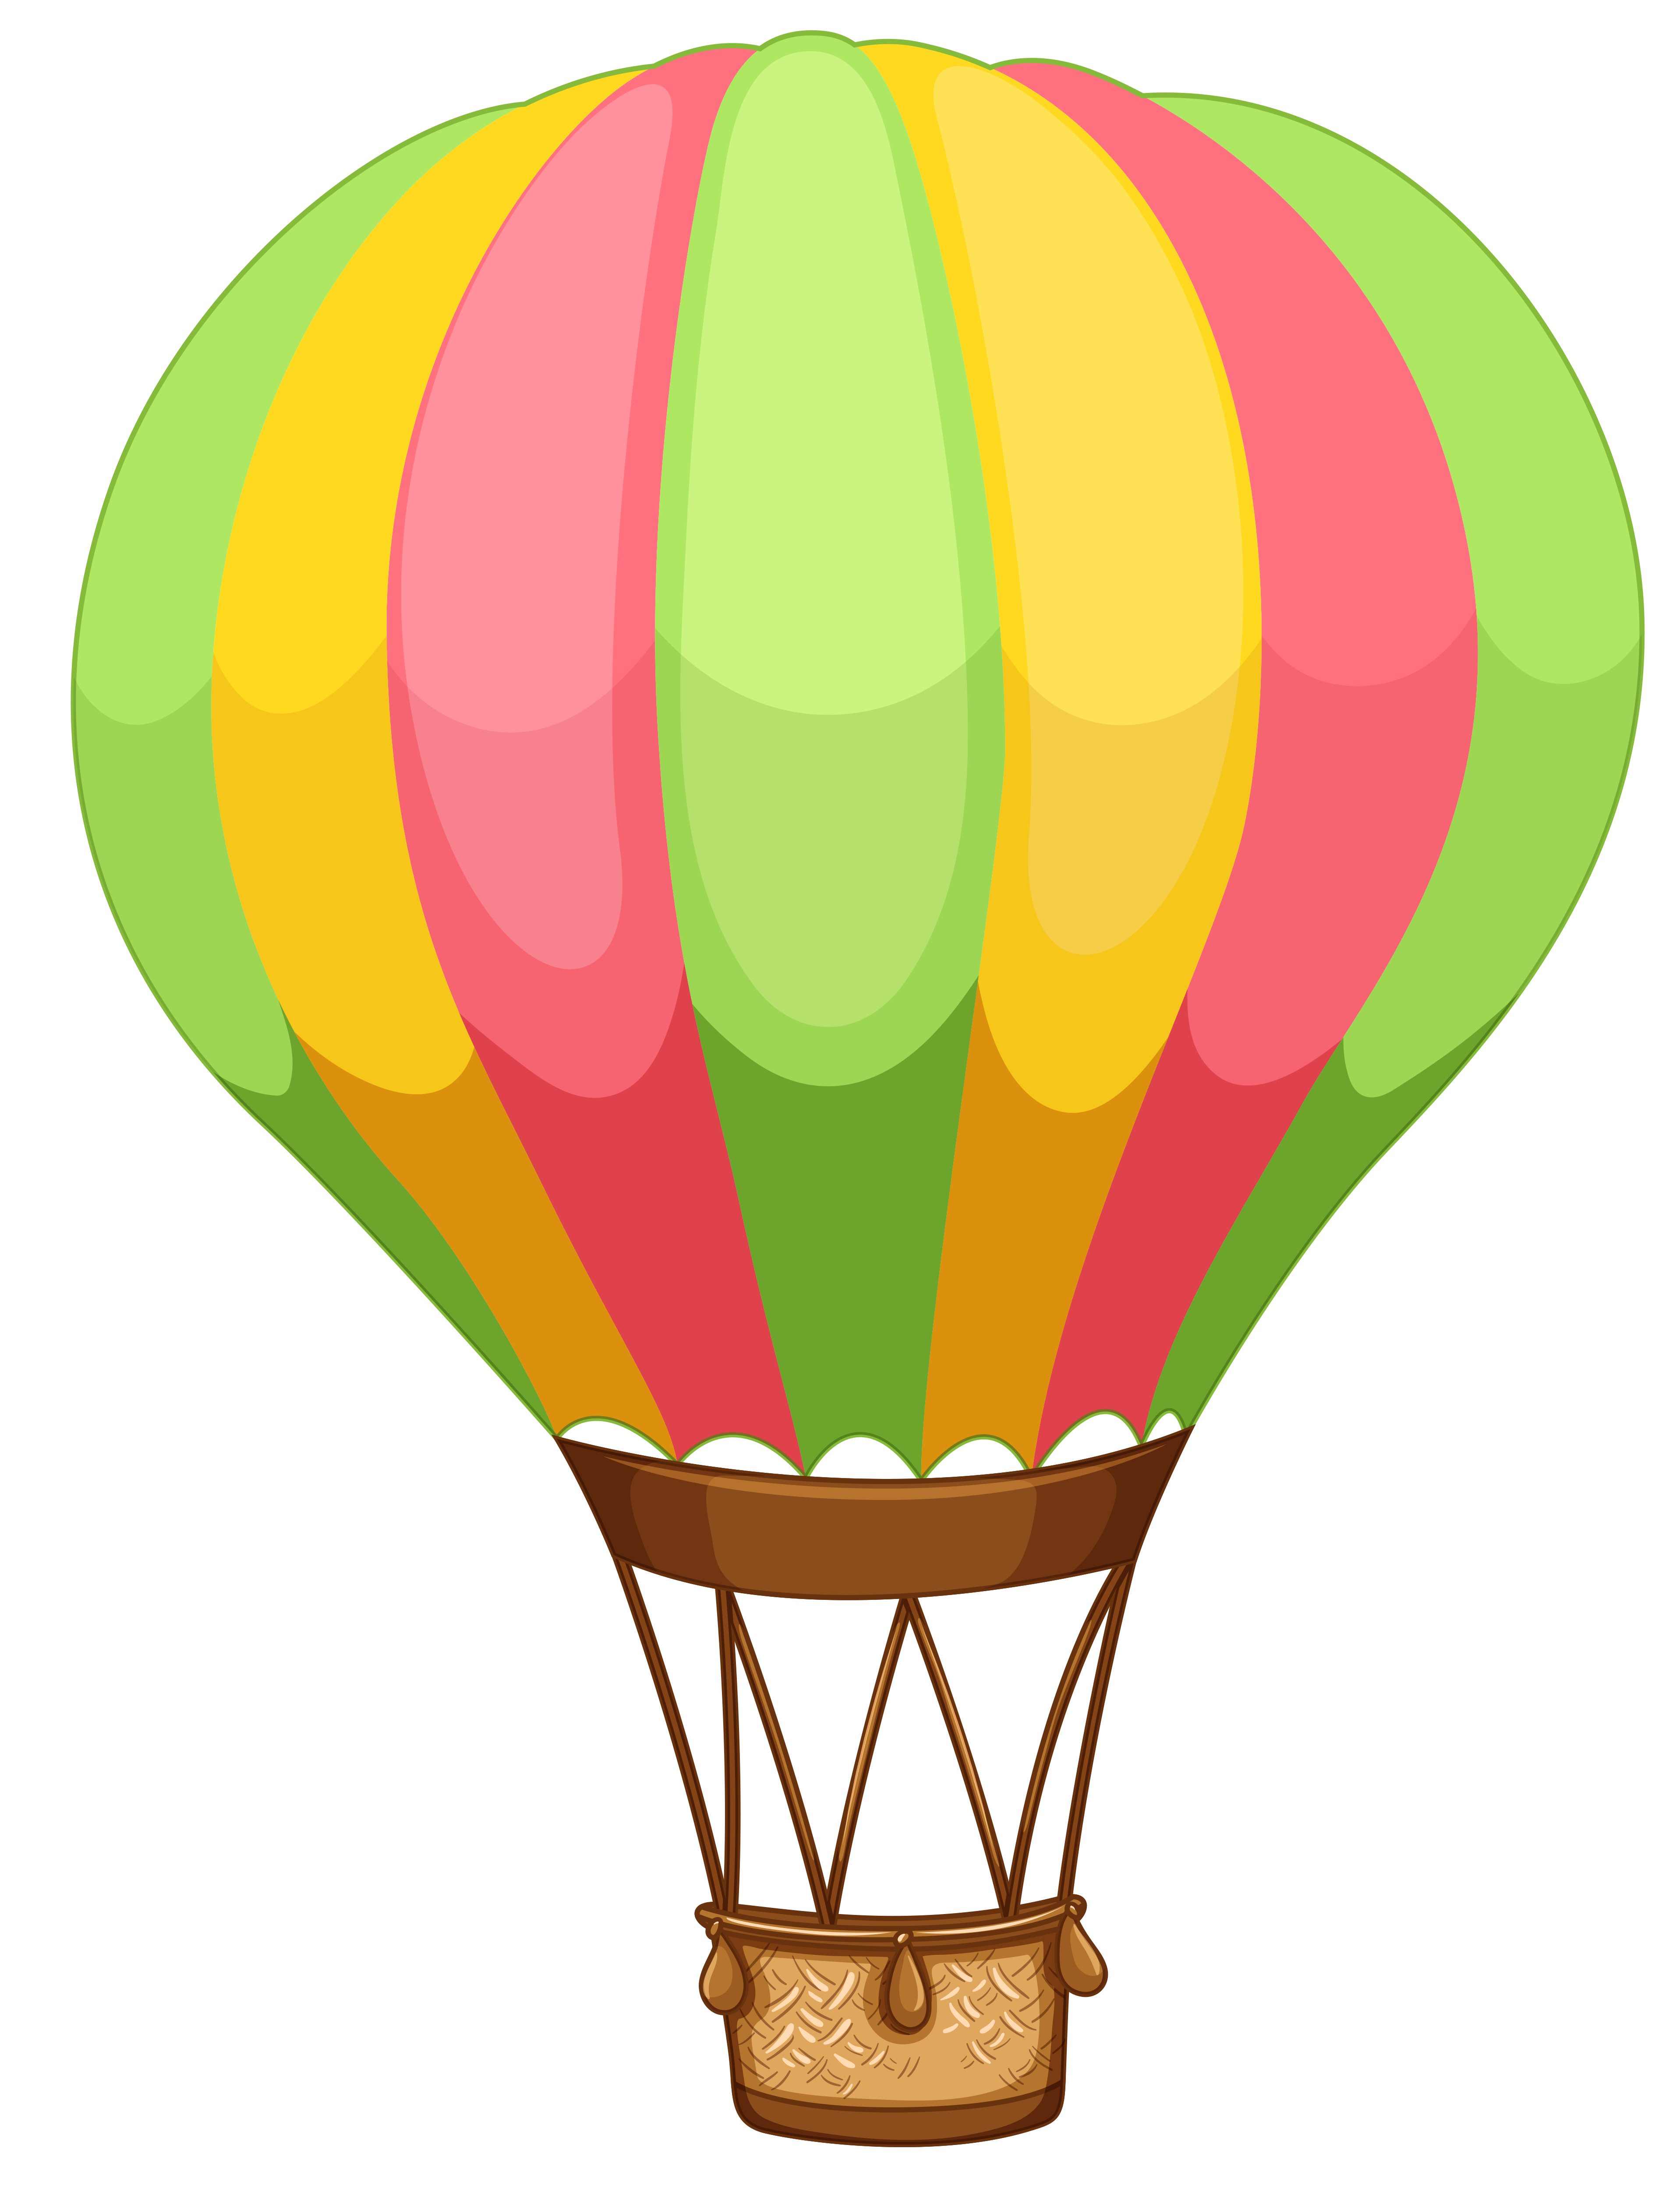 foto de Pin by Unloveable tum* * on Balloons ลูกโป่ง Pinterest